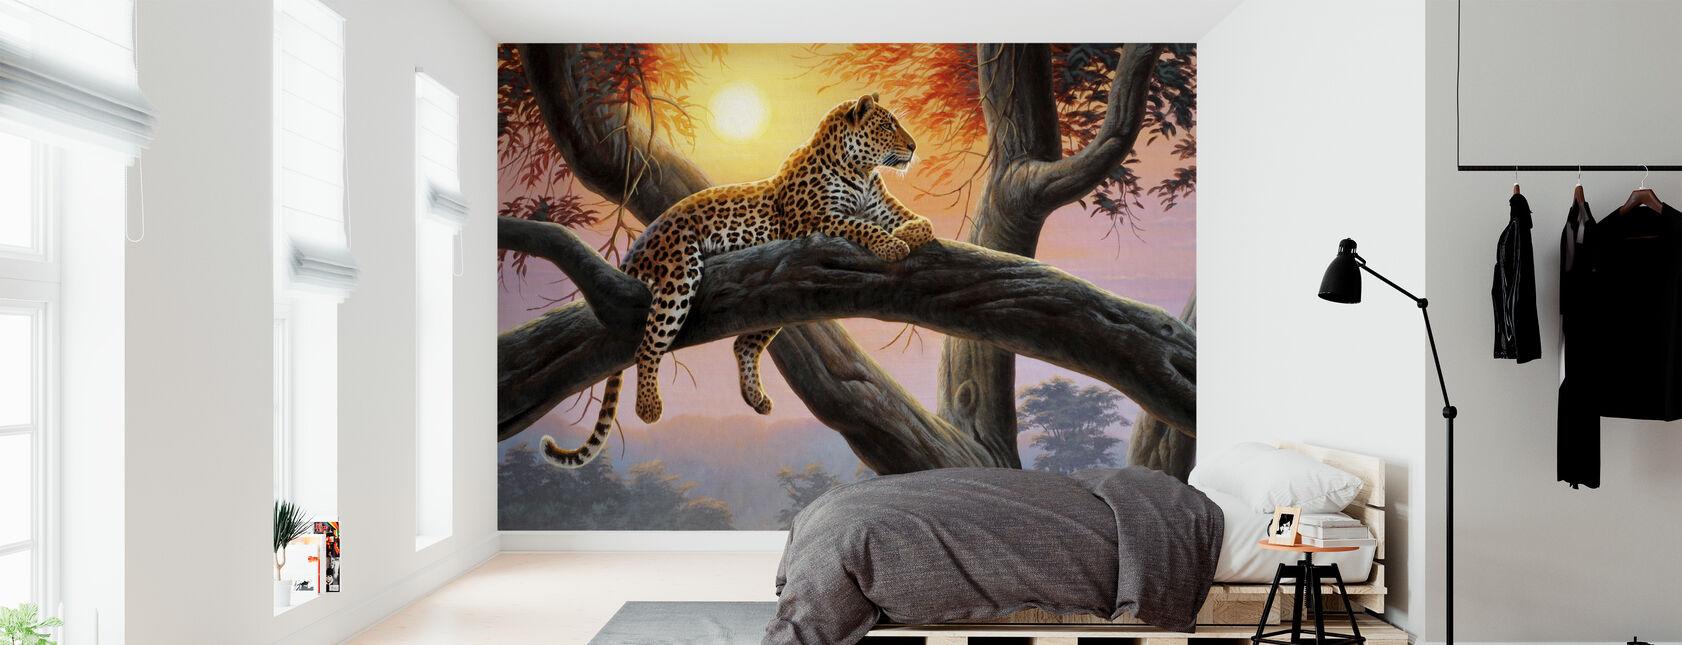 Avondhorloge - Luipaard - Behang - Slaapkamer